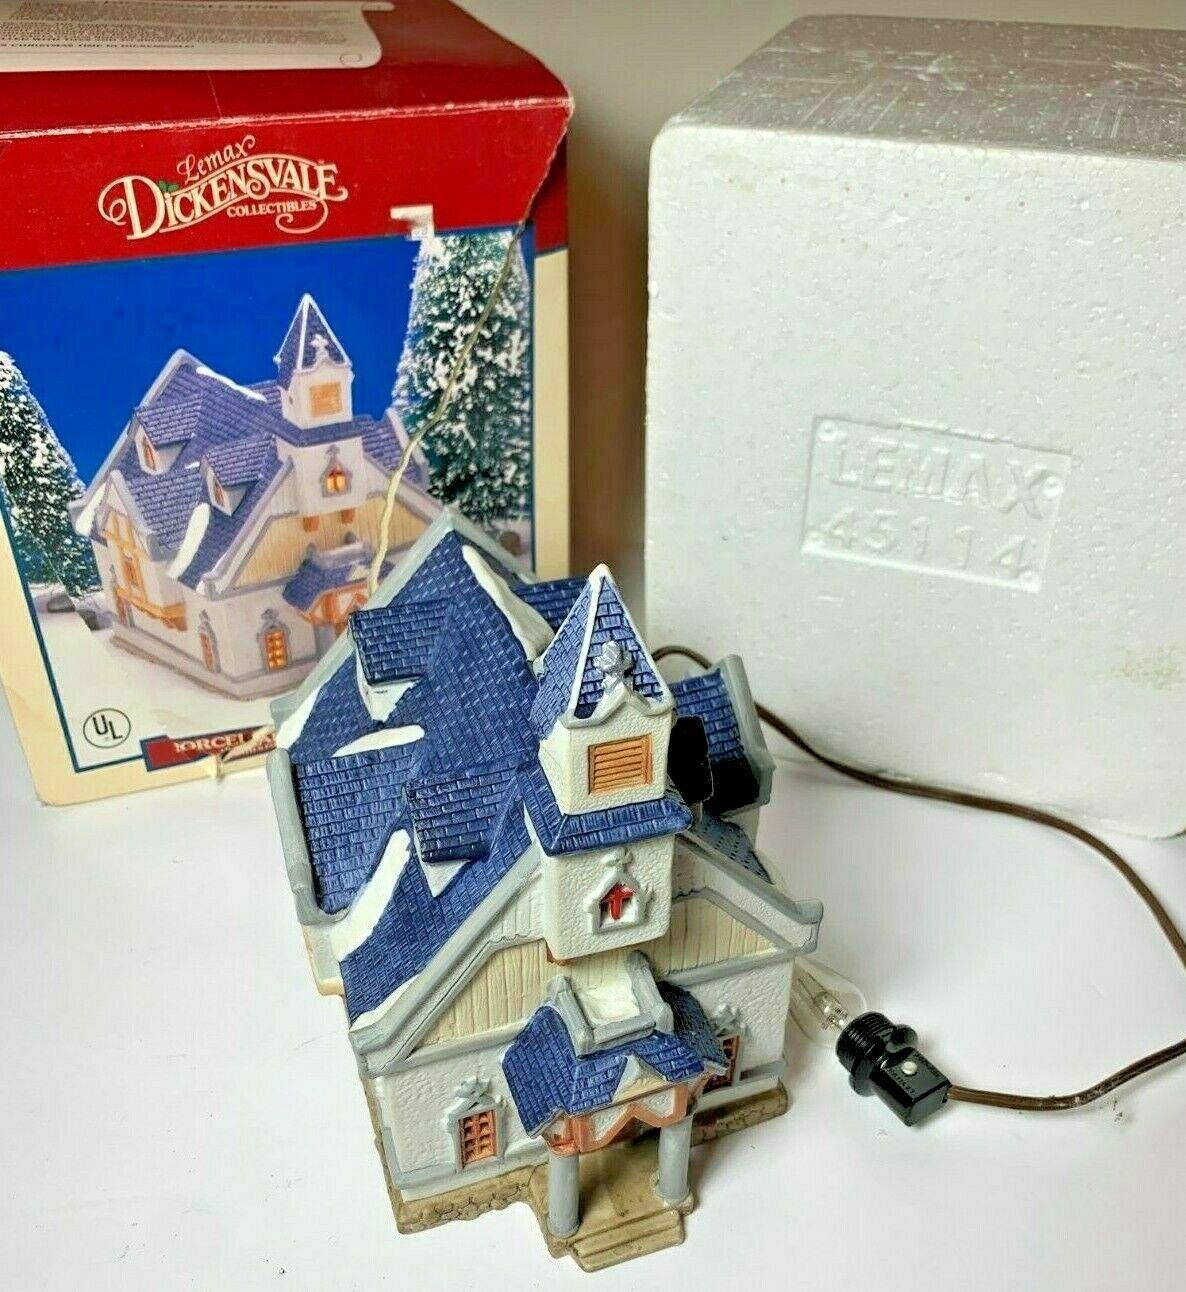 Vintage 1994 Lemax Dickensvale Blue Porcelain Lighted House Christmas   - $19.95